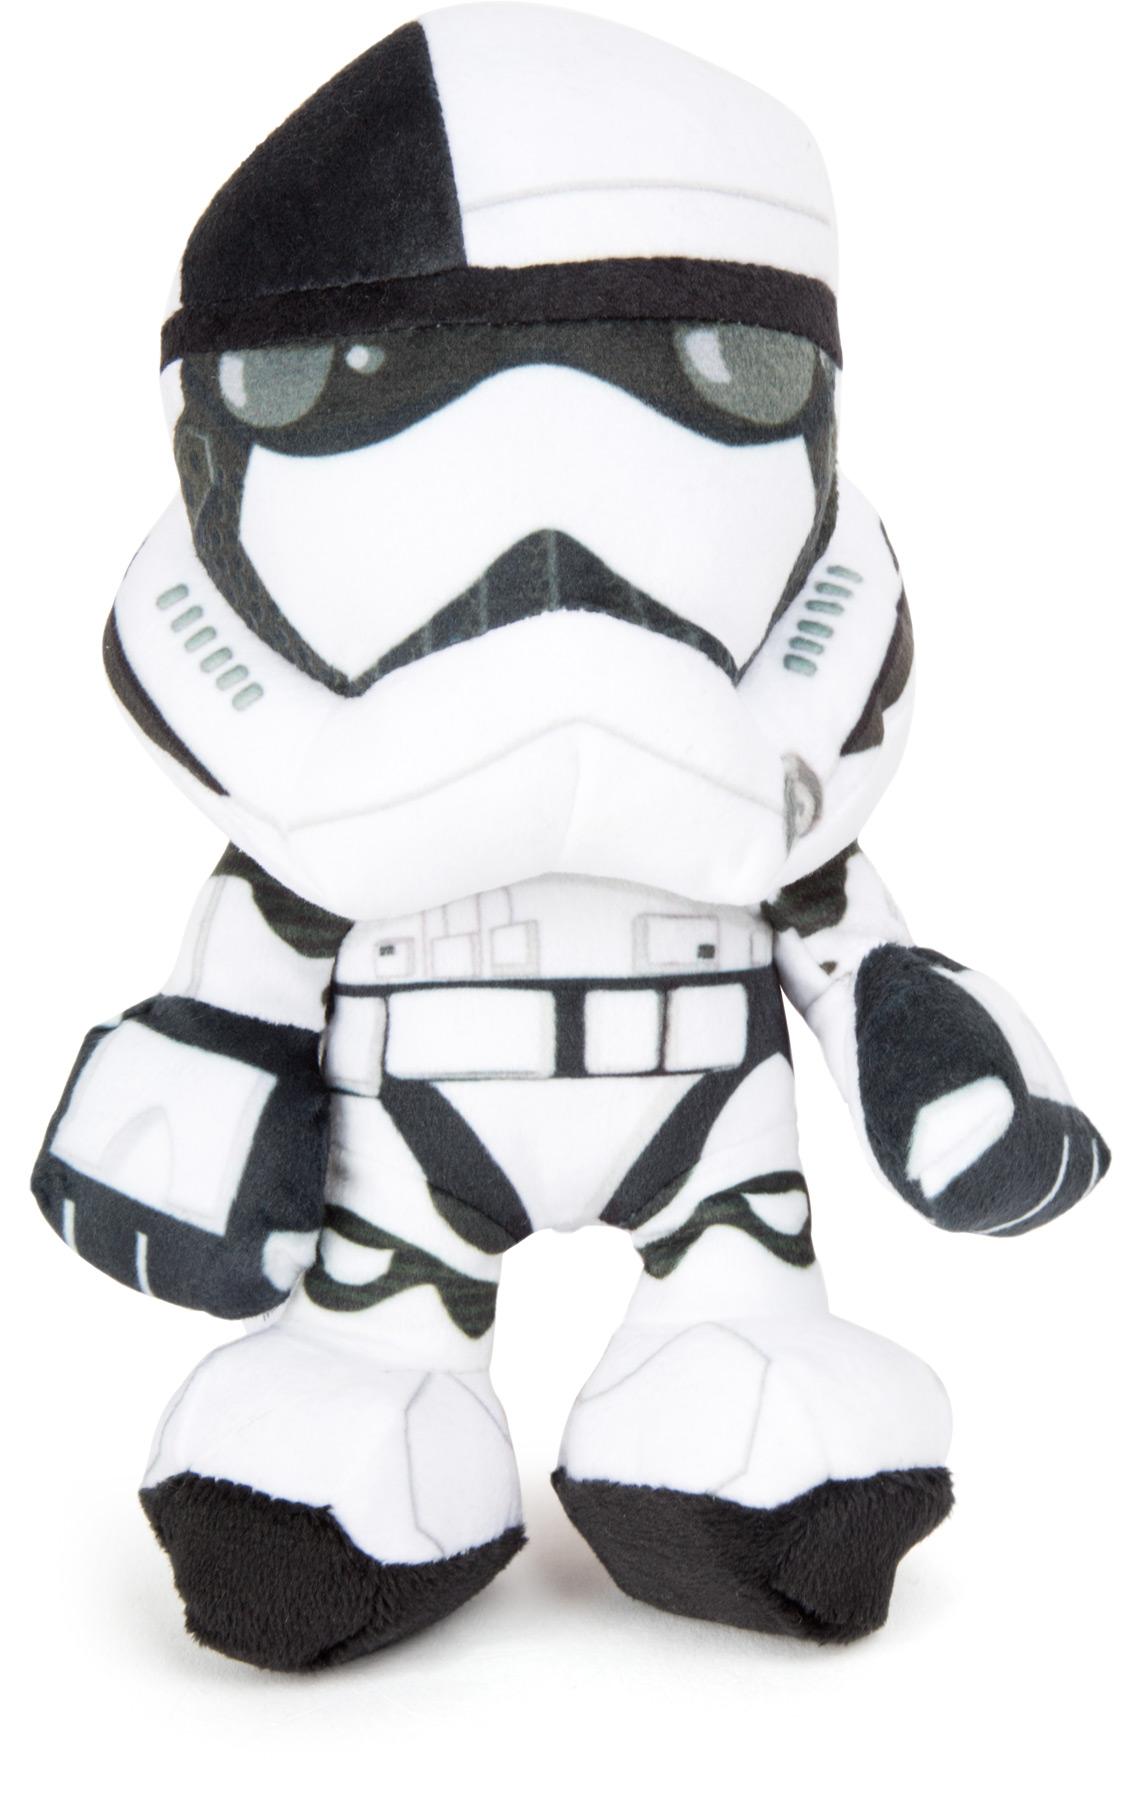 Small Foot Star Wars plyšový Popravčí trooper